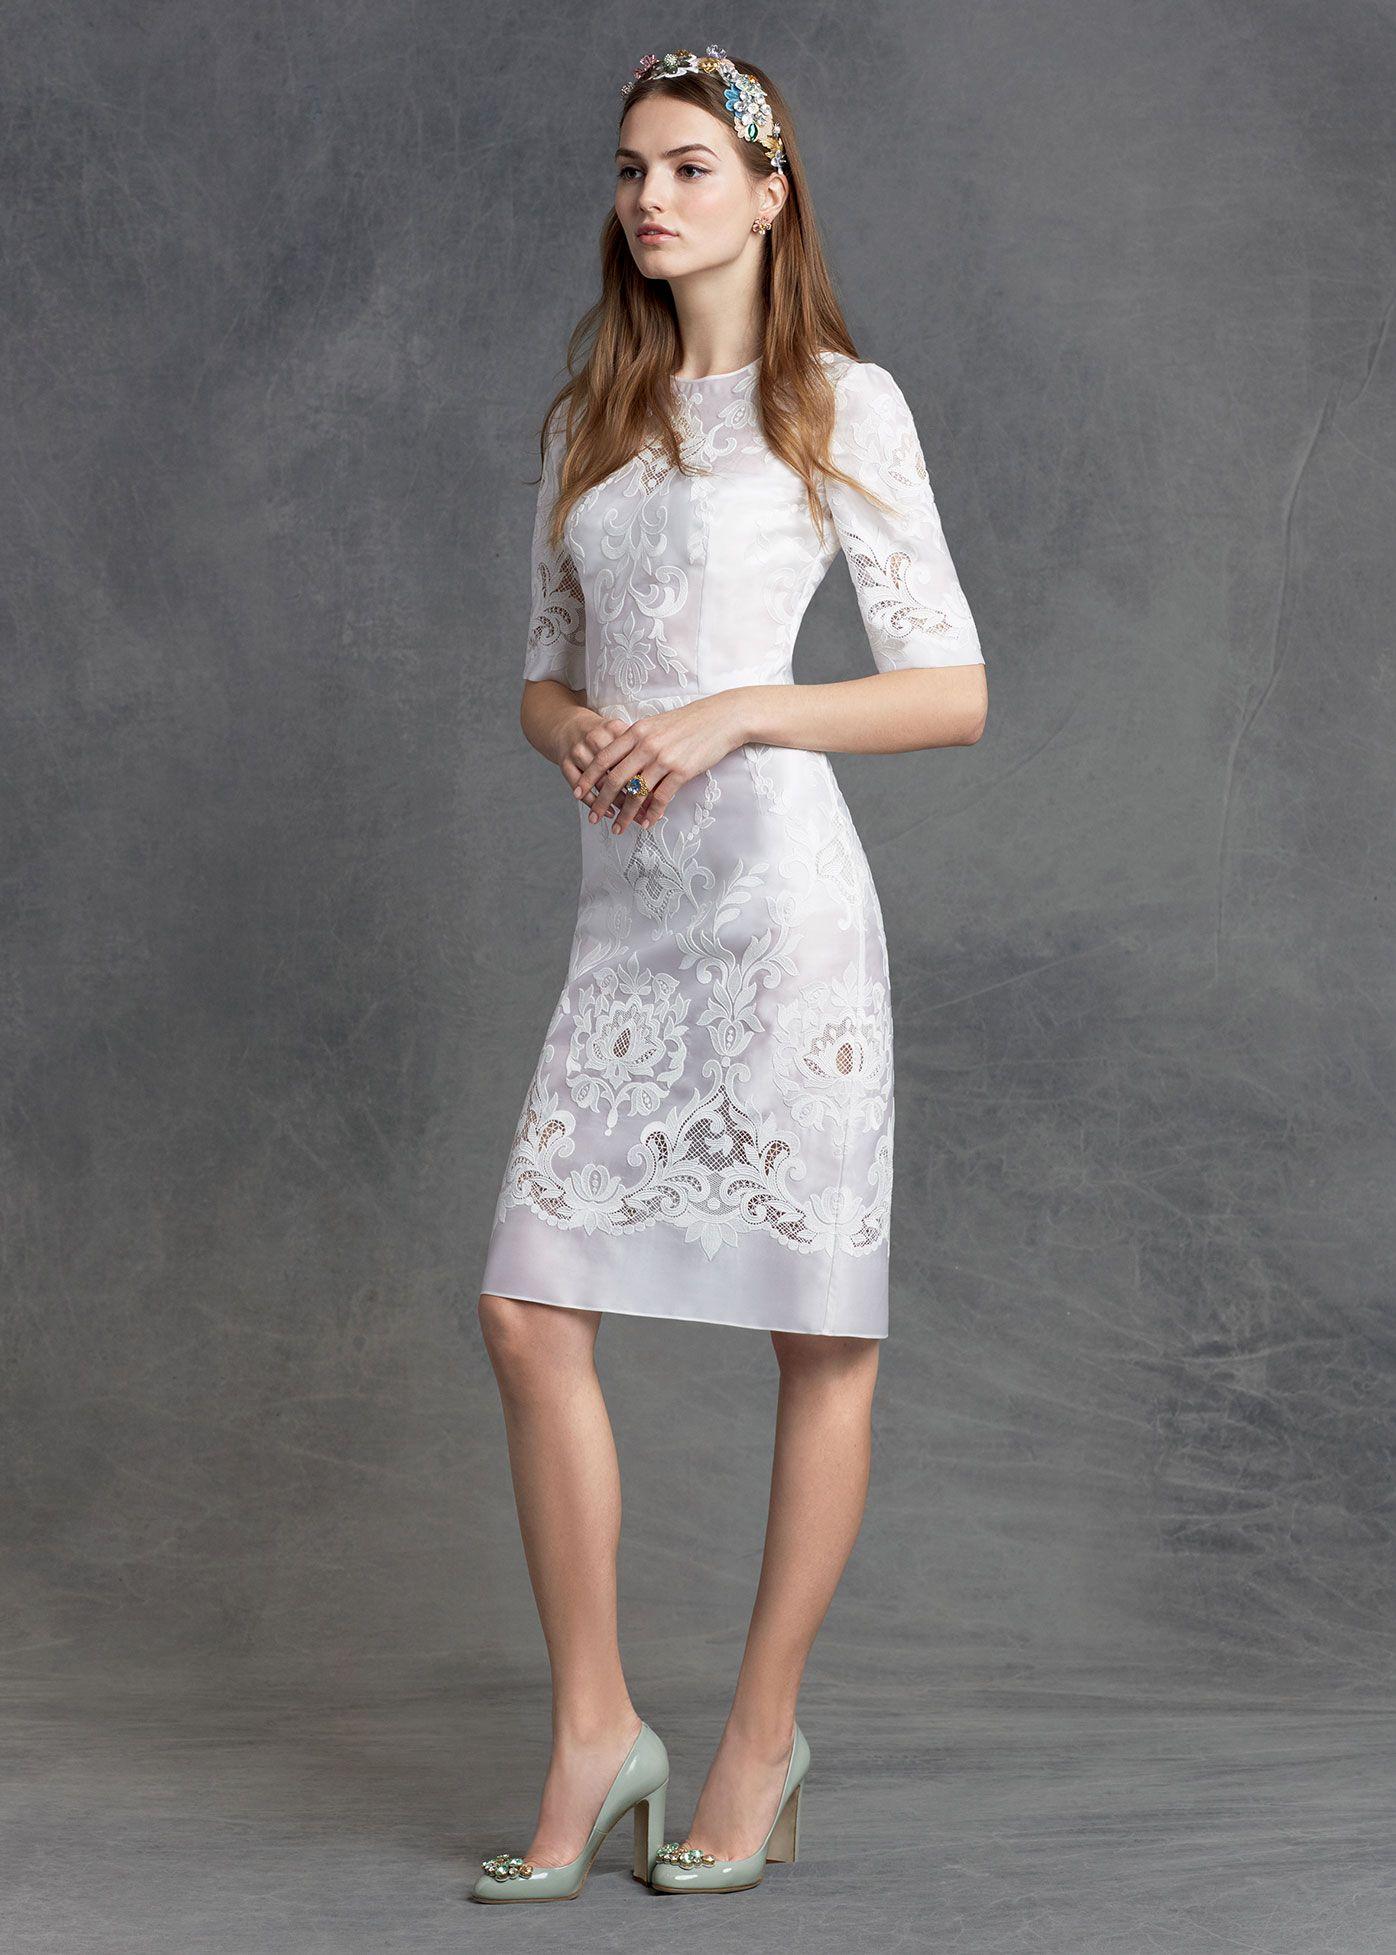 Dolce u gabbana womenus clothing collection winter wedding